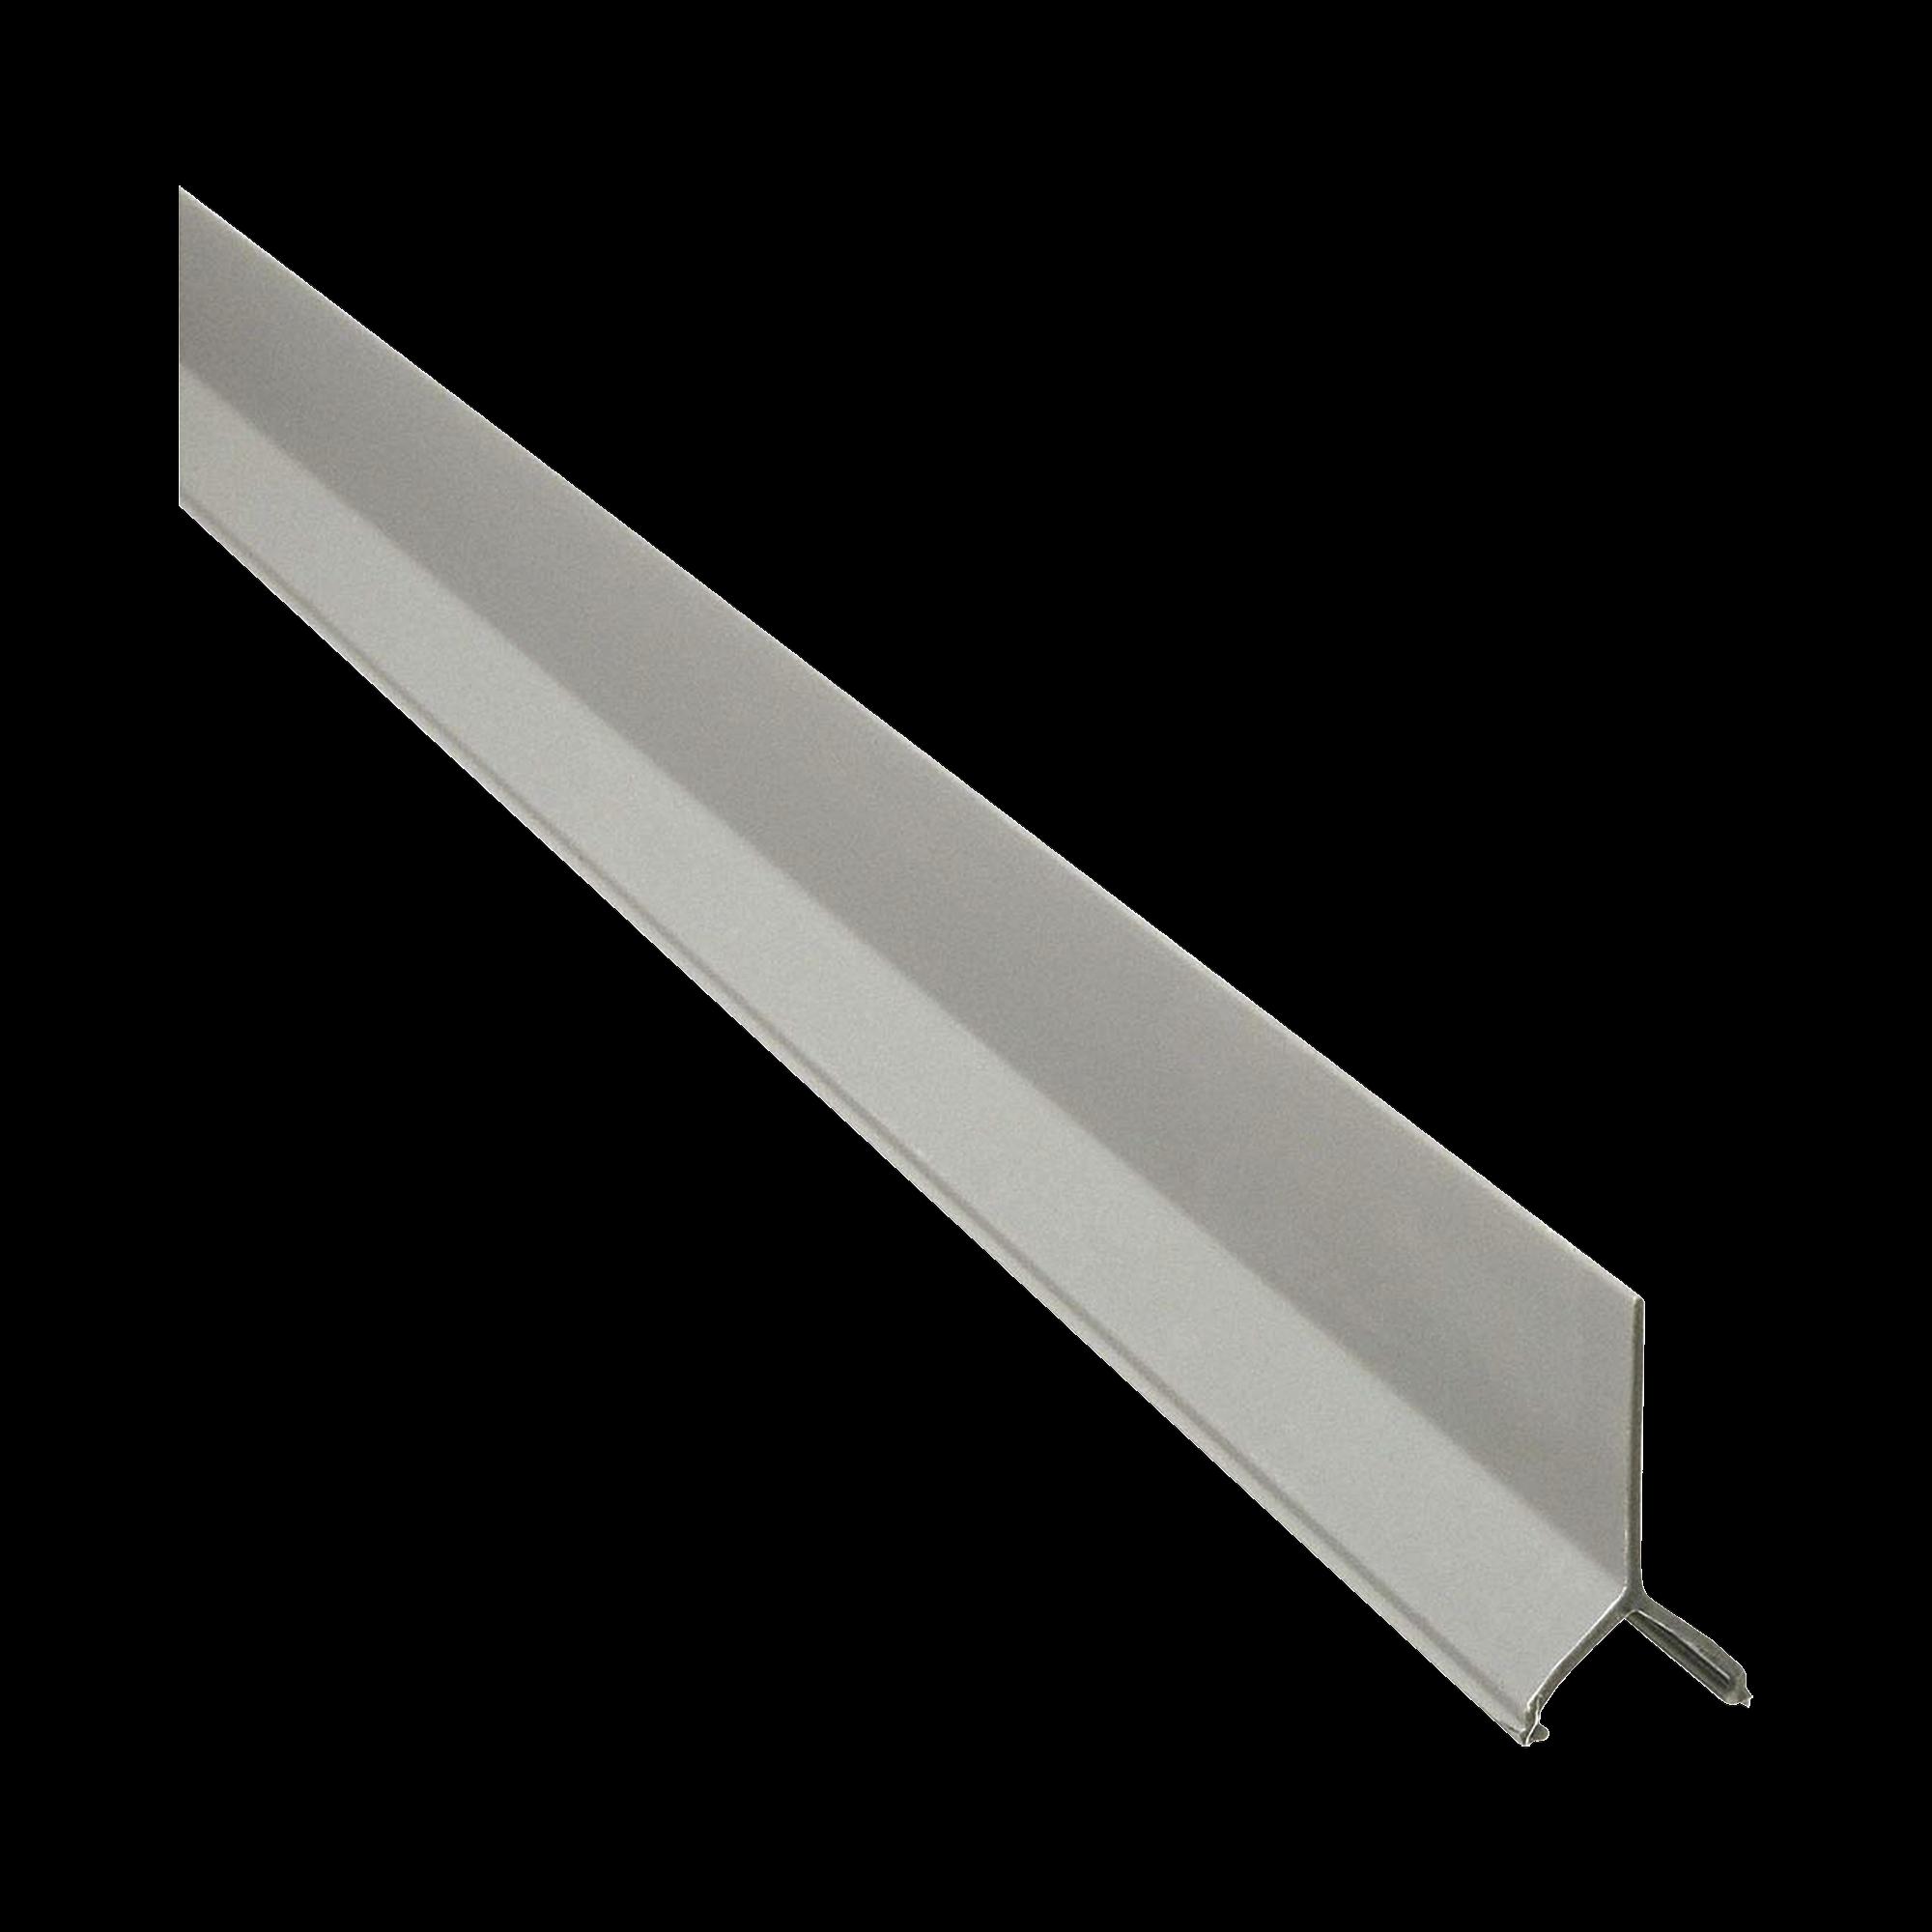 Divisor para uso con canaletas T70, Material PVC Rígido, 2.4 m de Largo, Color Gris Internacional